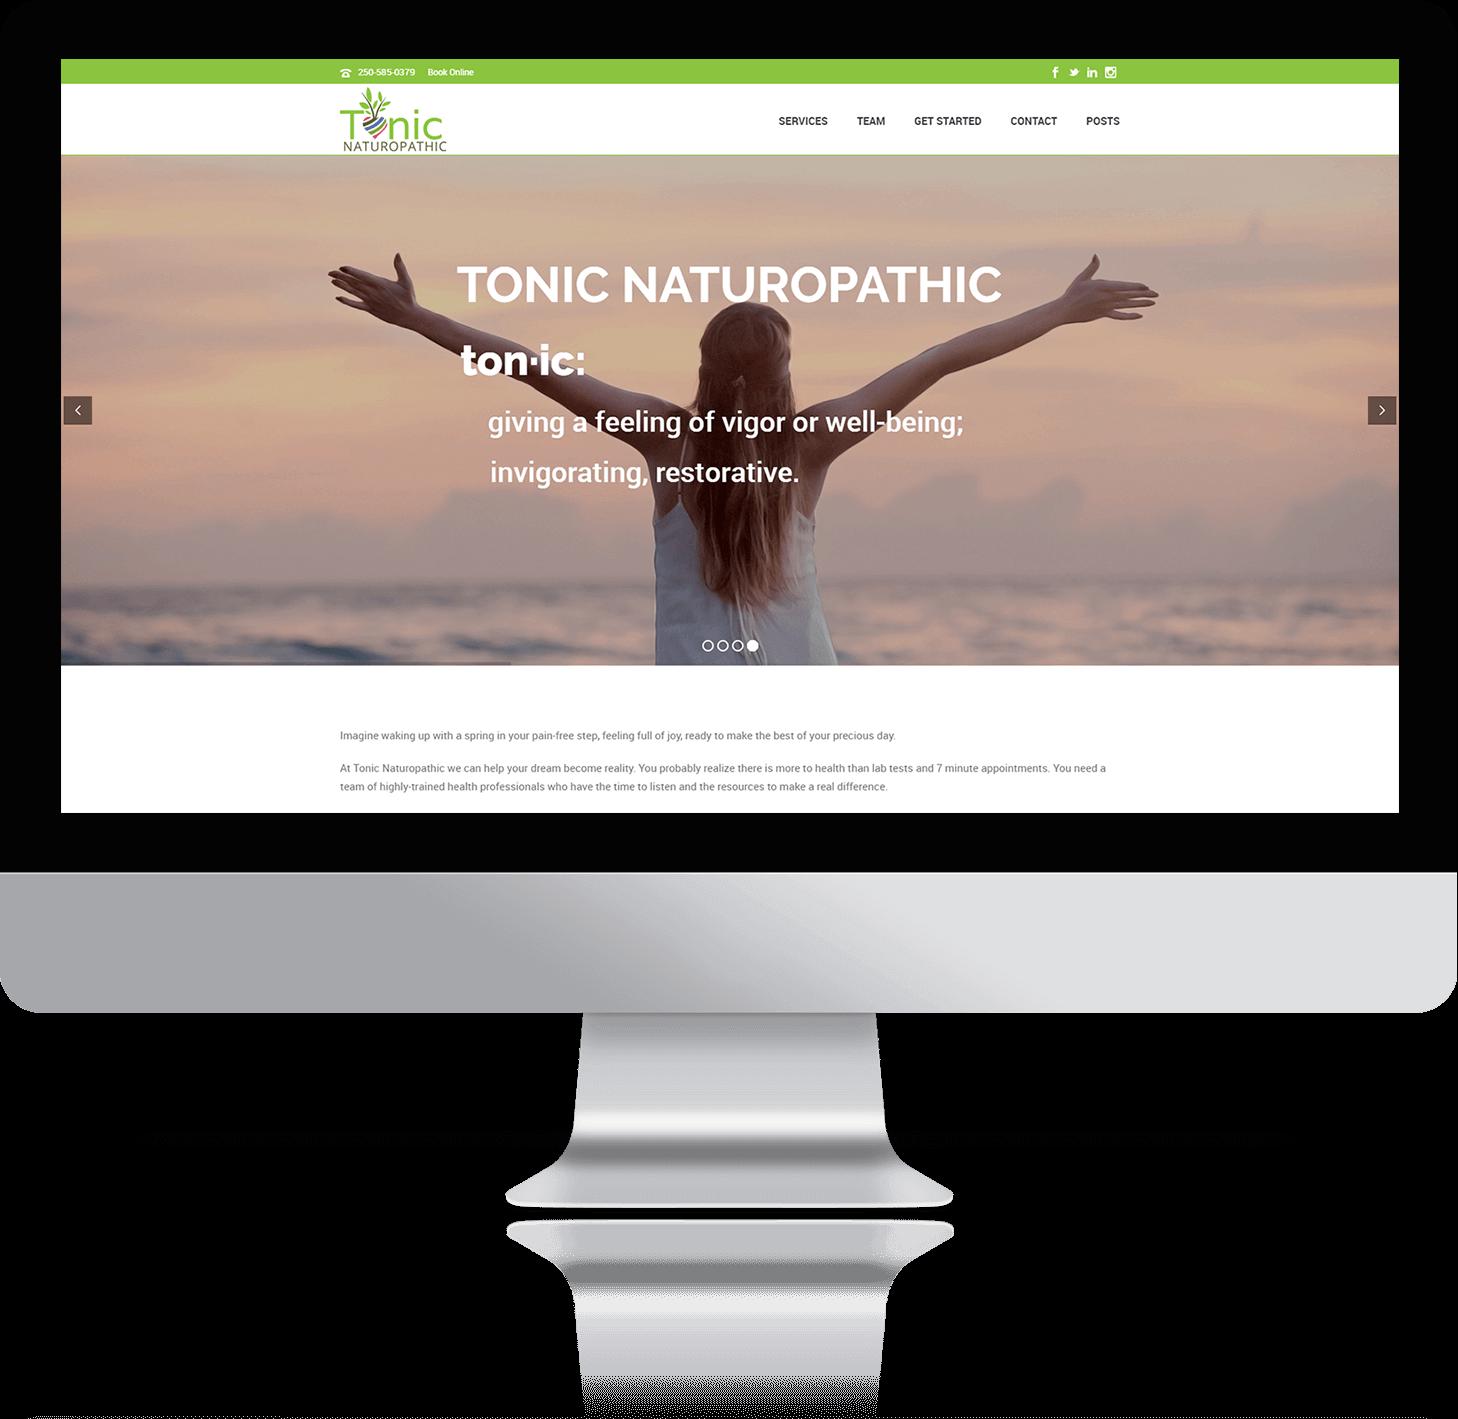 Tonic Naturopathic